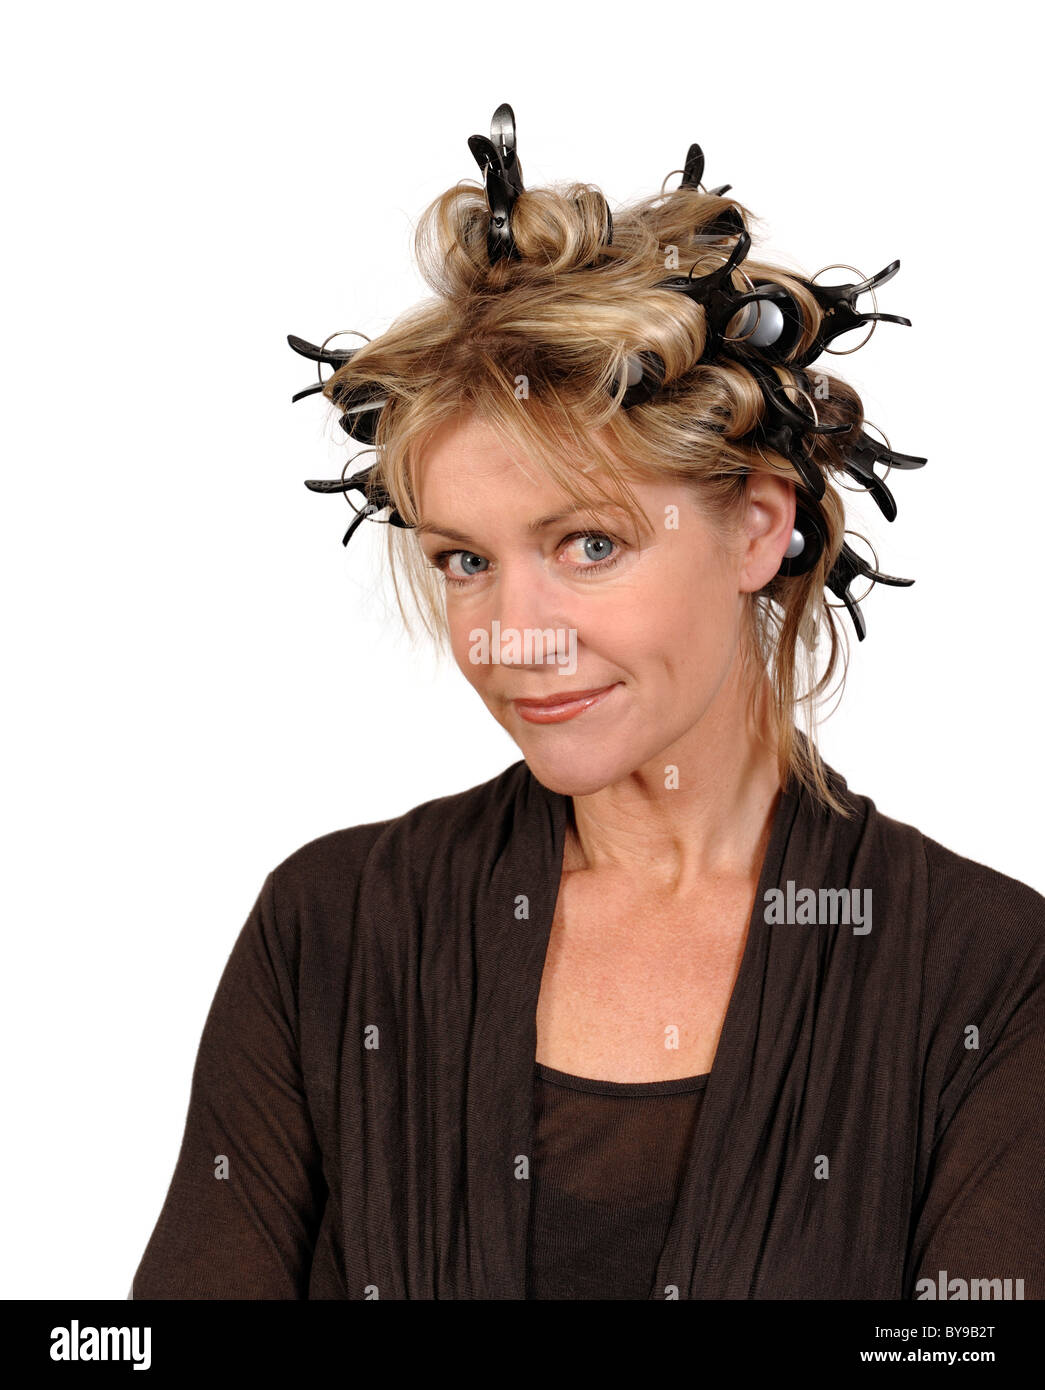 Mujer vistiendo rizadores de pelo Imagen De Stock